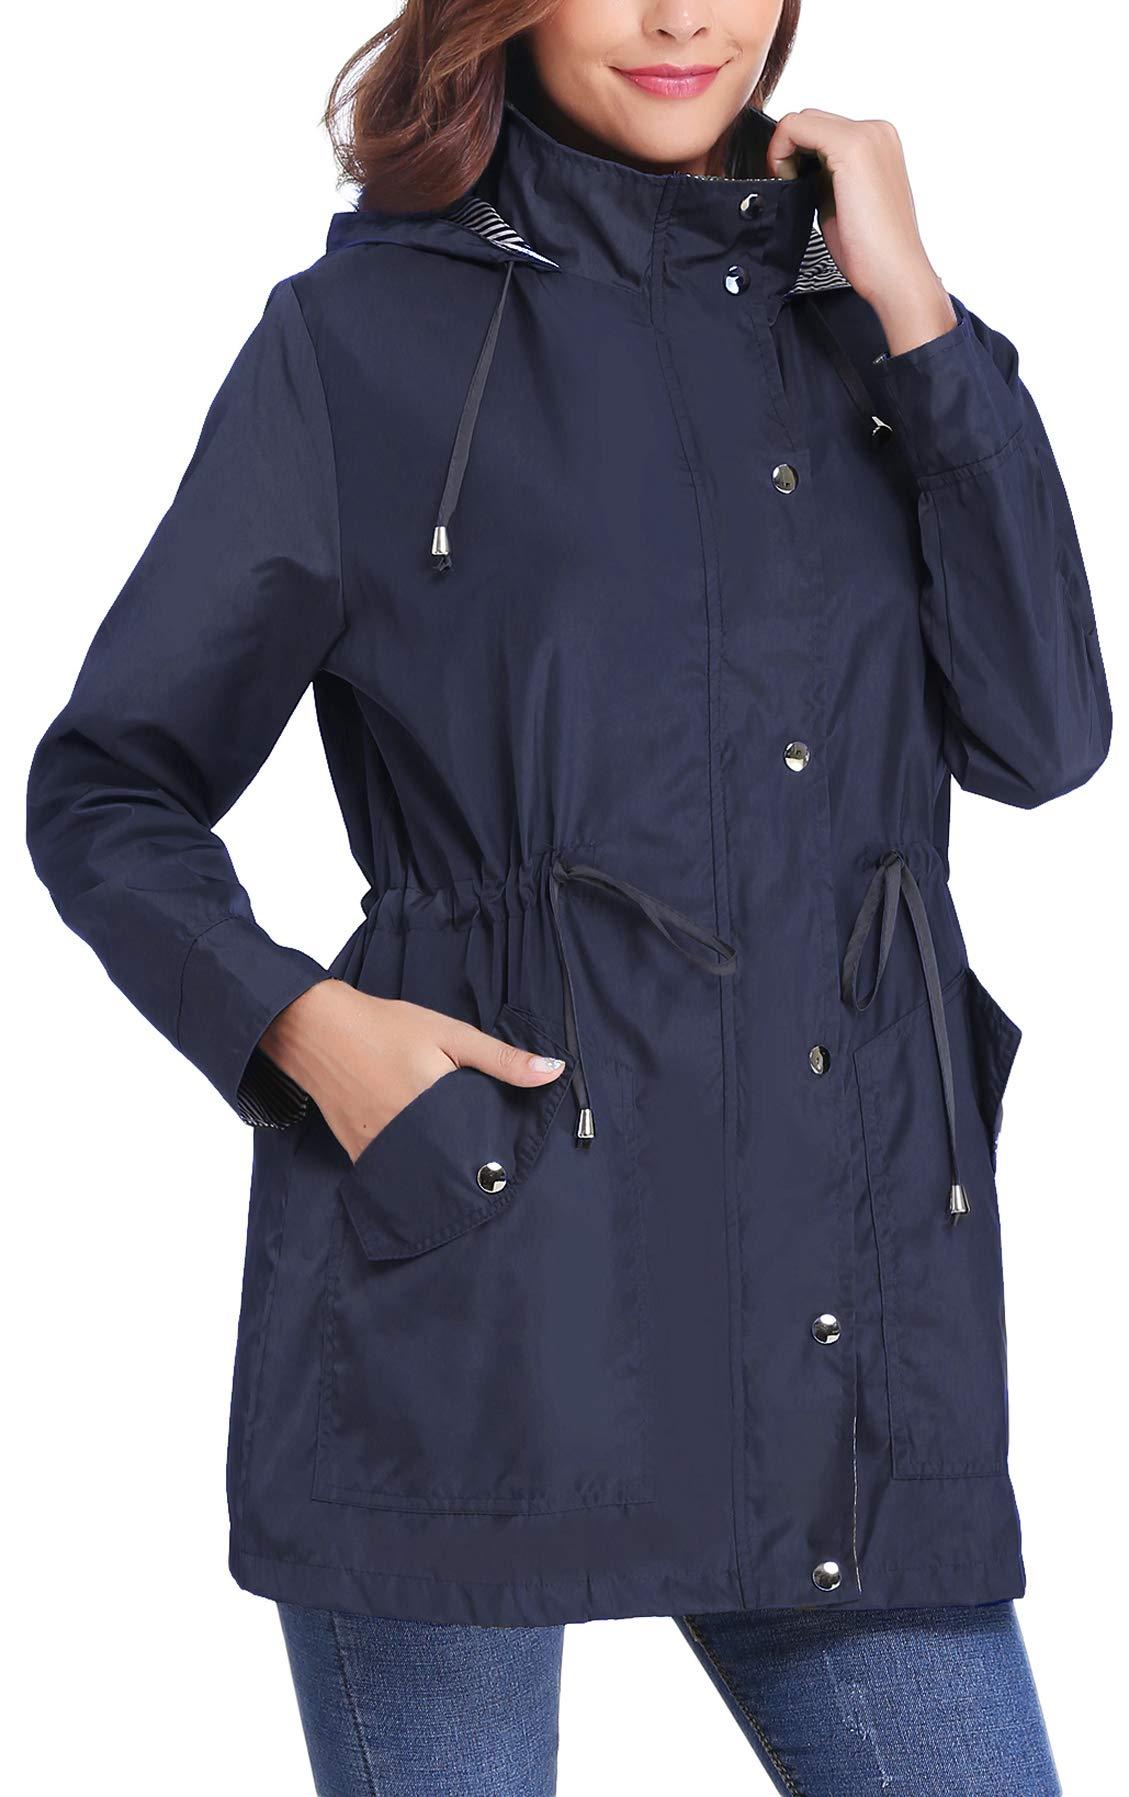 iClosam Women Raincoats Waterproof Lightweight Rain Jacket Active Outdoor Hooded Trench Coat (Navy Blue, Medium)